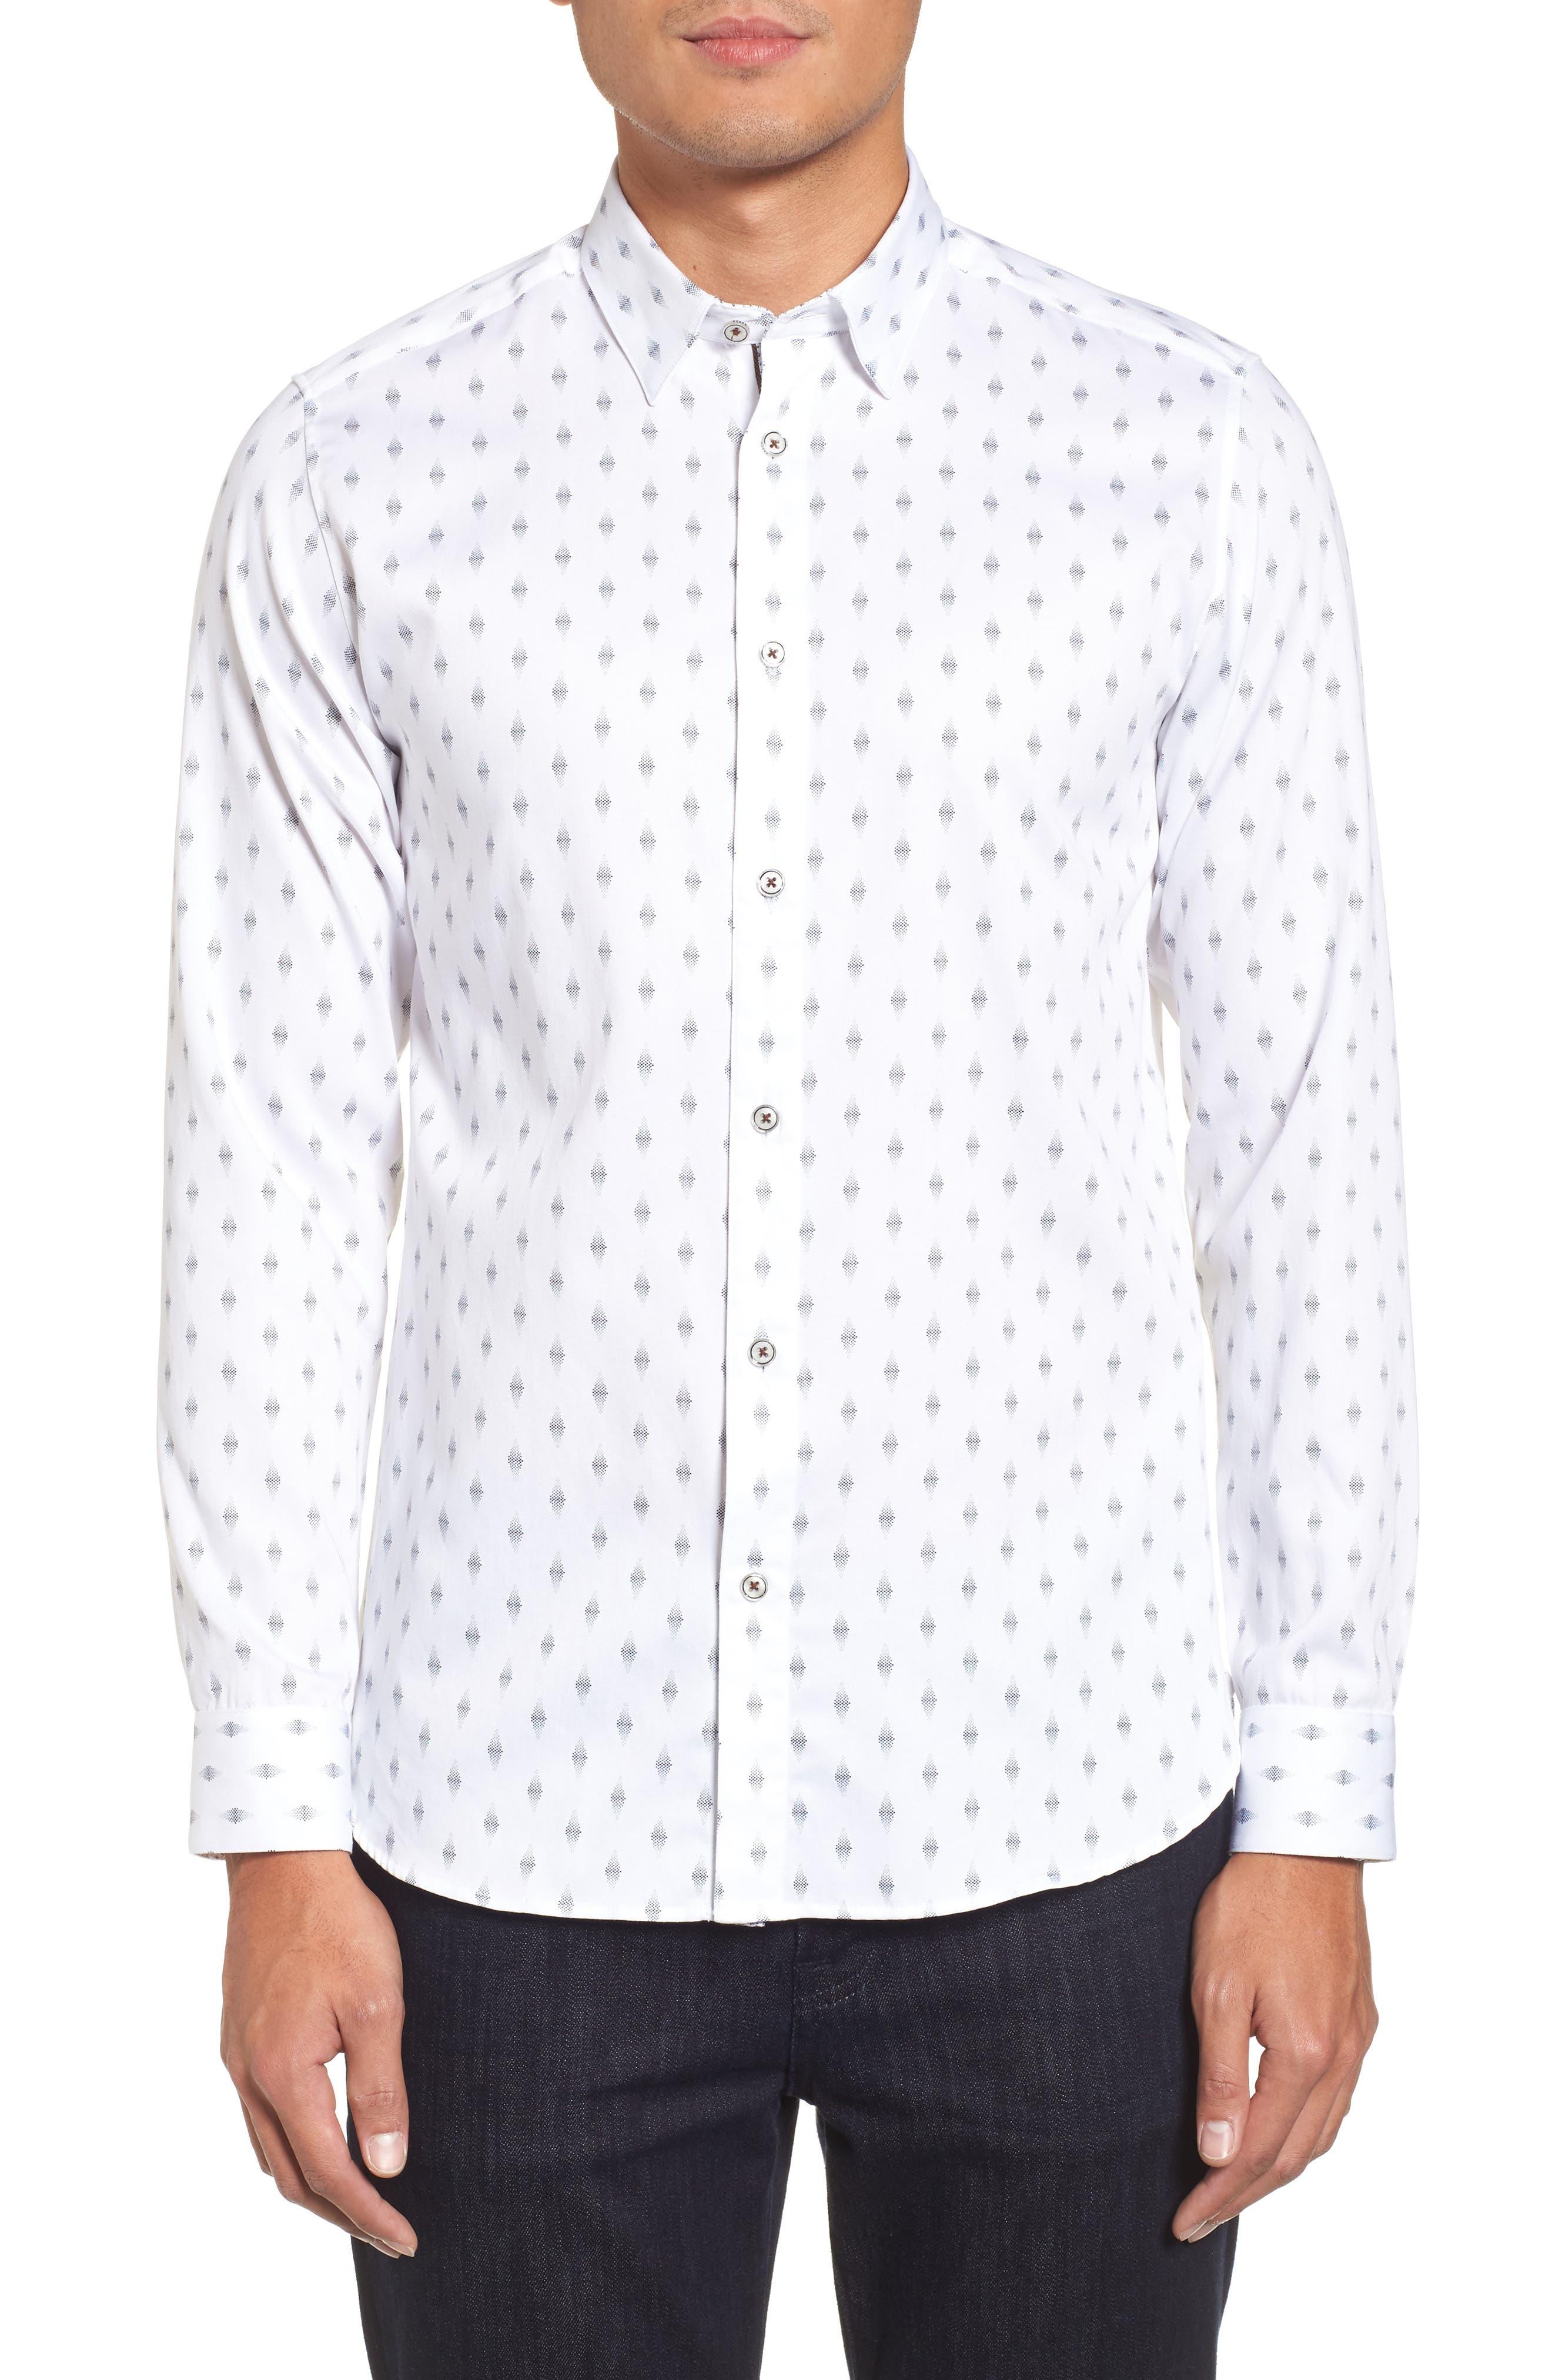 Monico Slim Fit Dot Diamond Sport Shirt,                             Main thumbnail 1, color,                             White